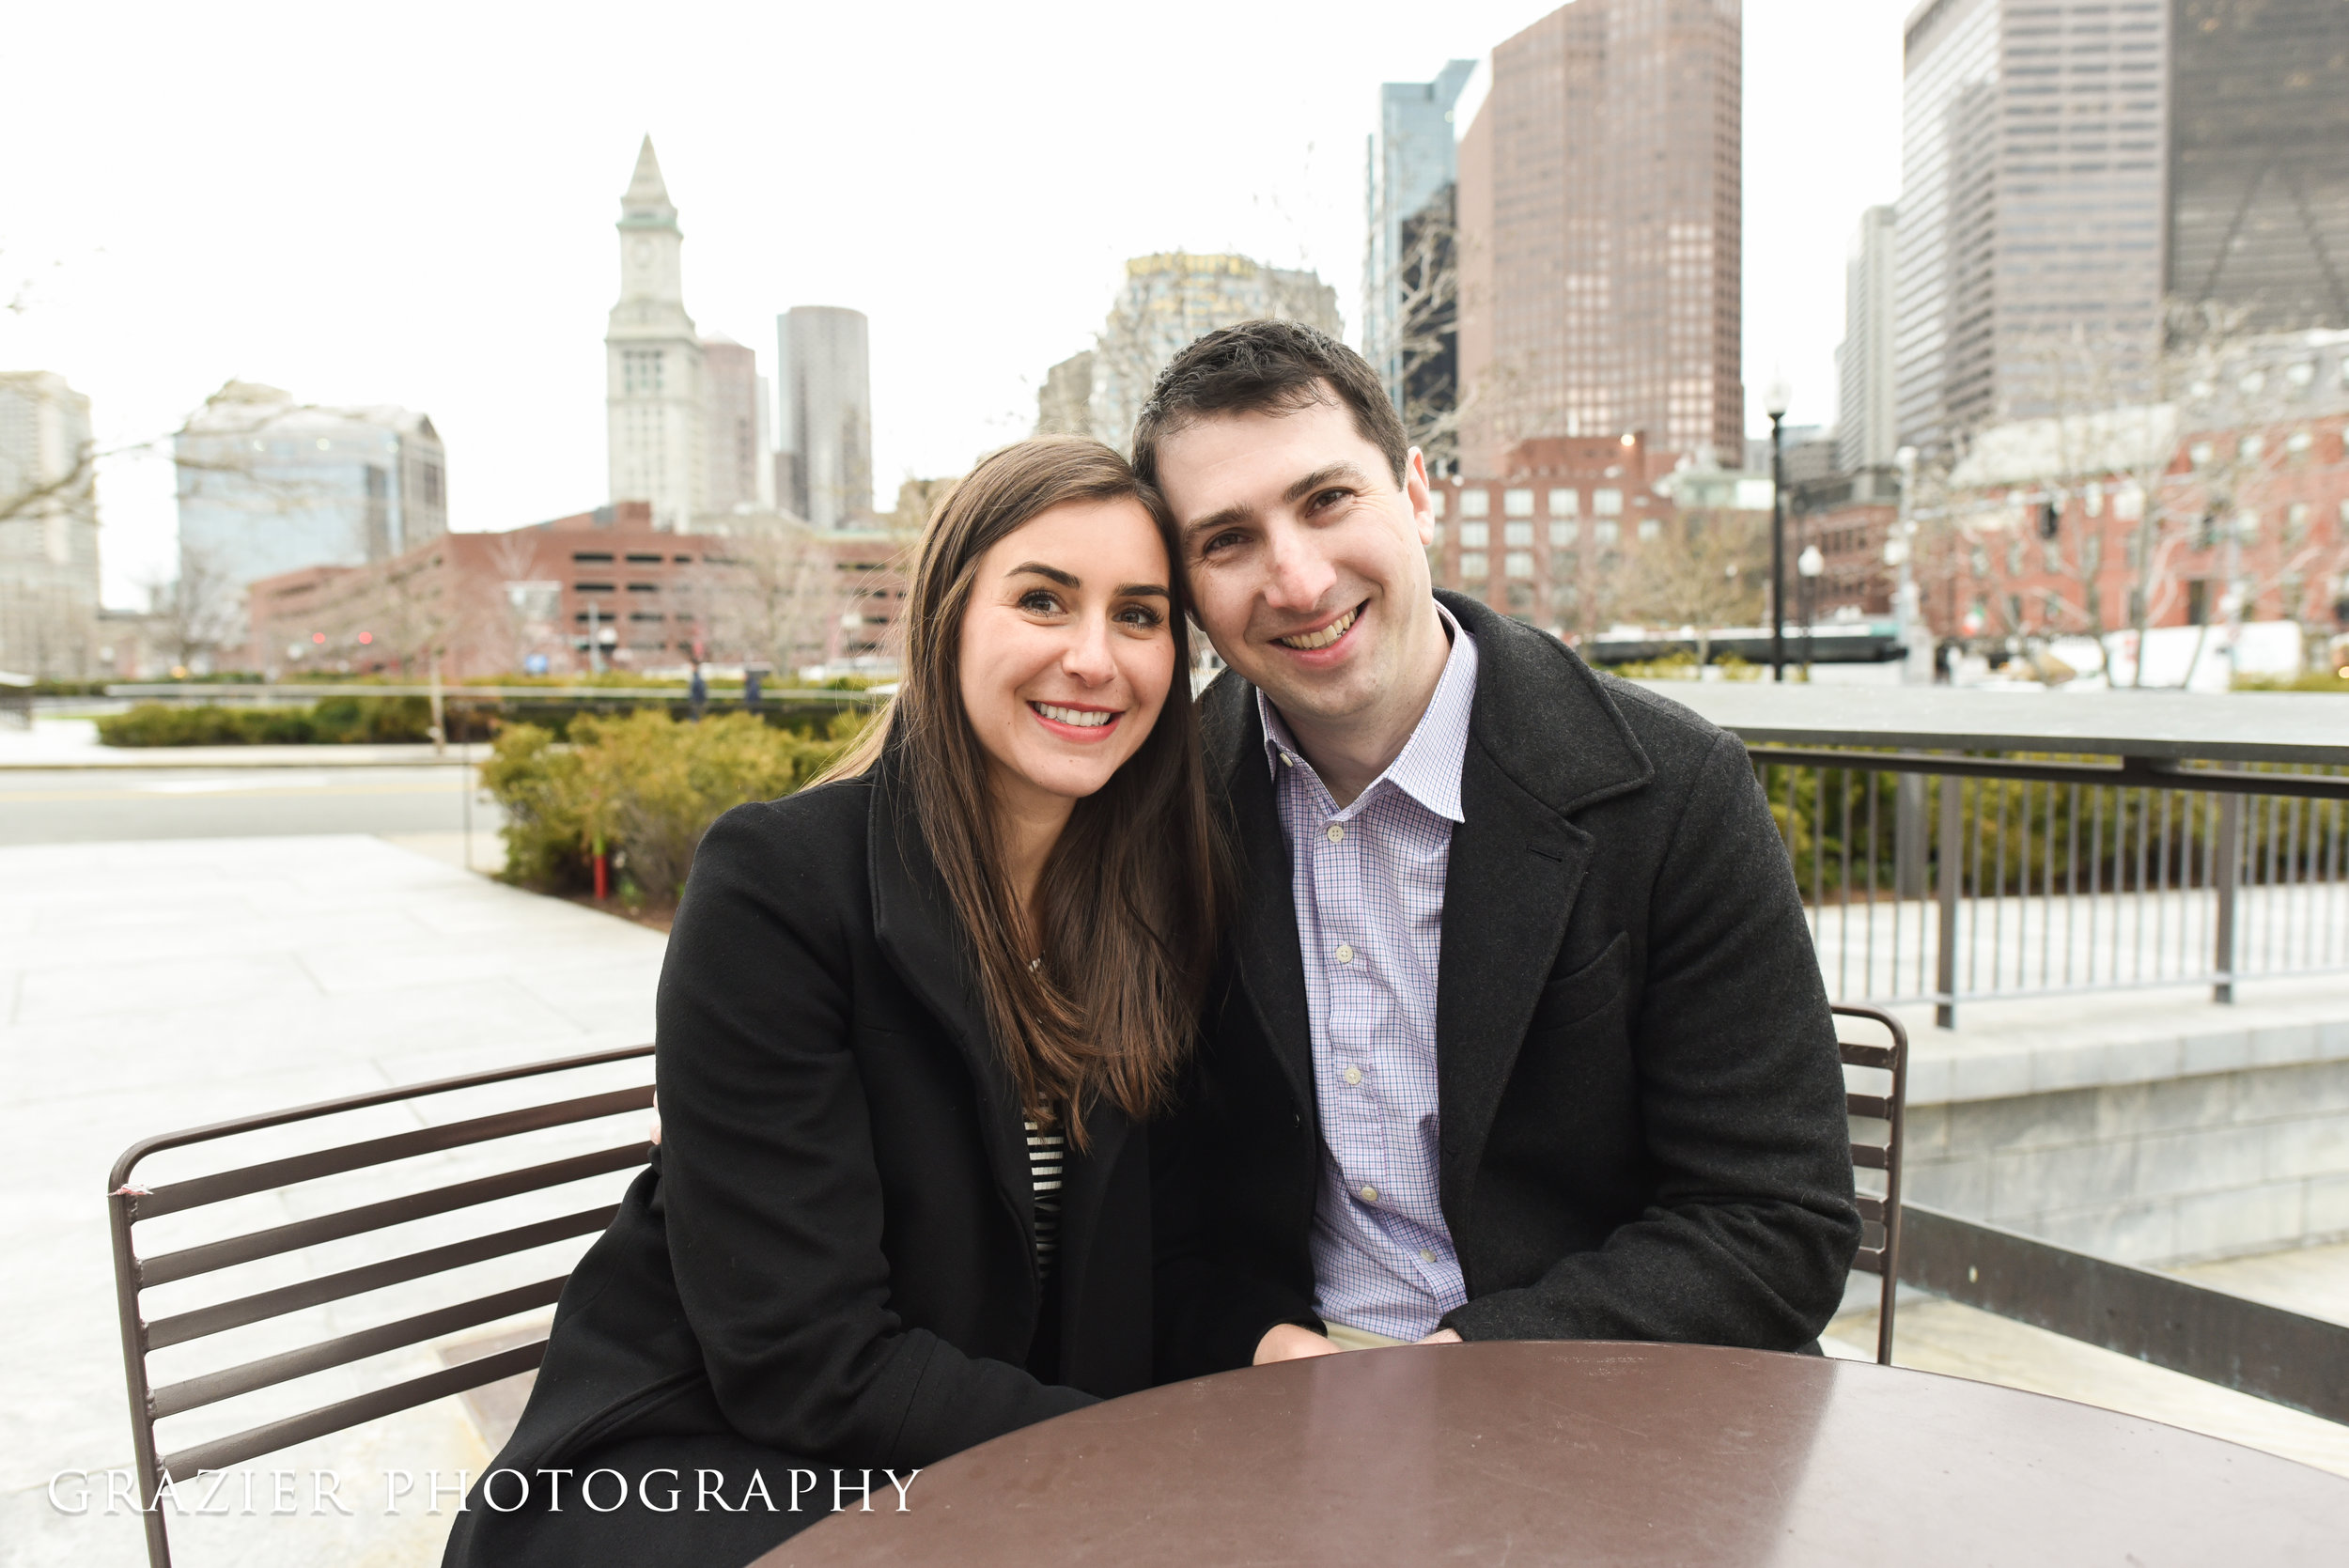 Boston Engagement Grazier Photography 4_2017-022.jpg